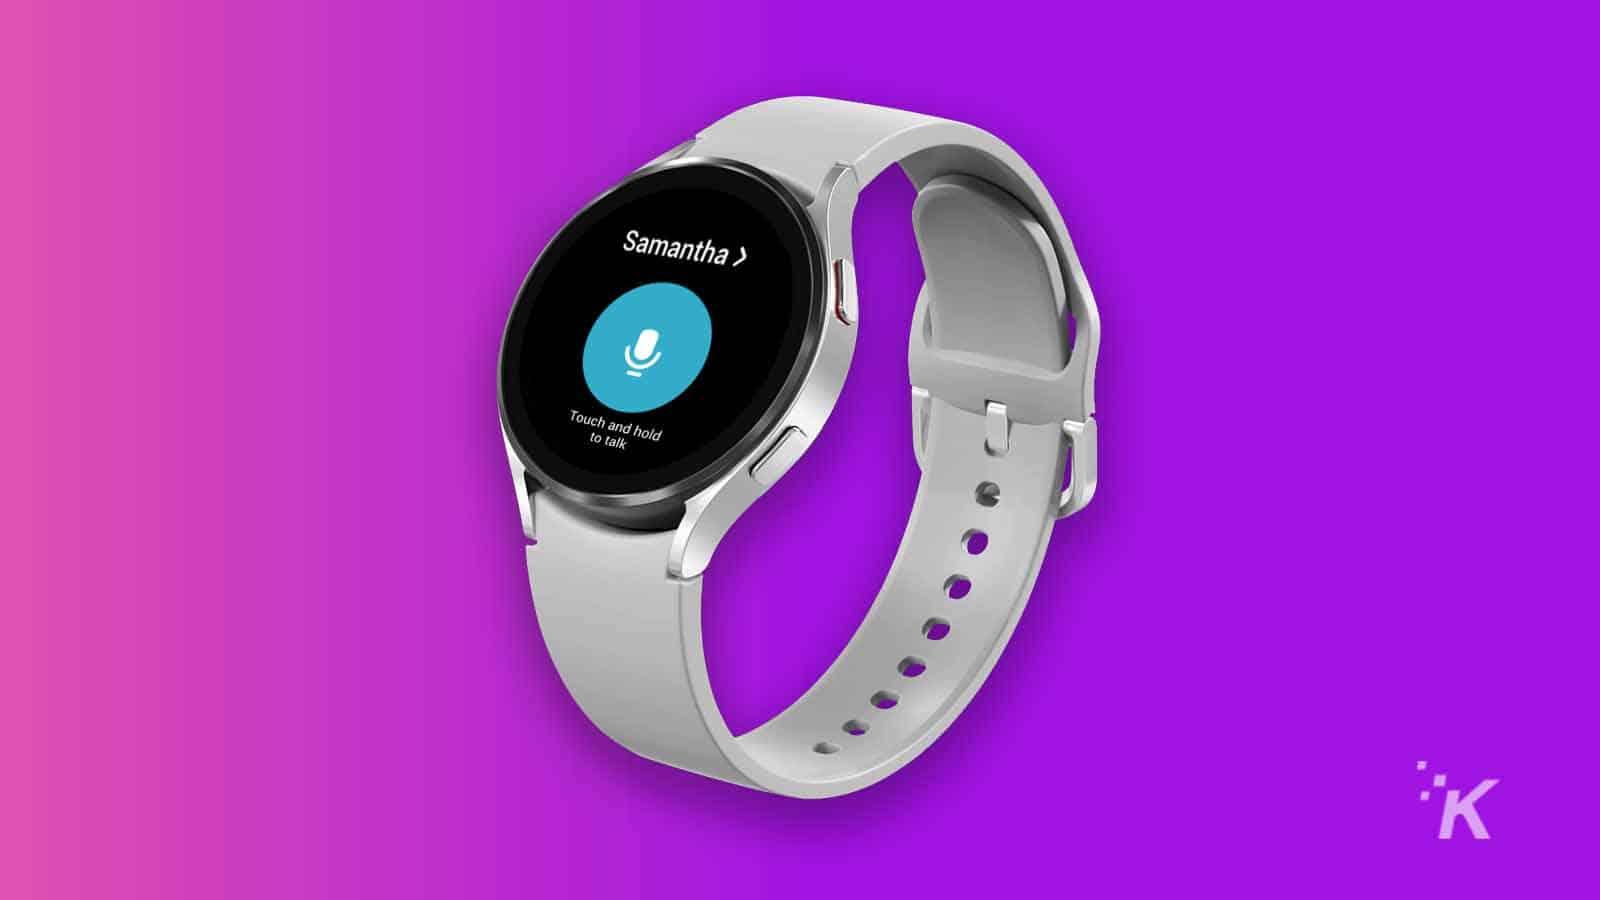 samsung galaxy watch 4 with walkie-talkie app